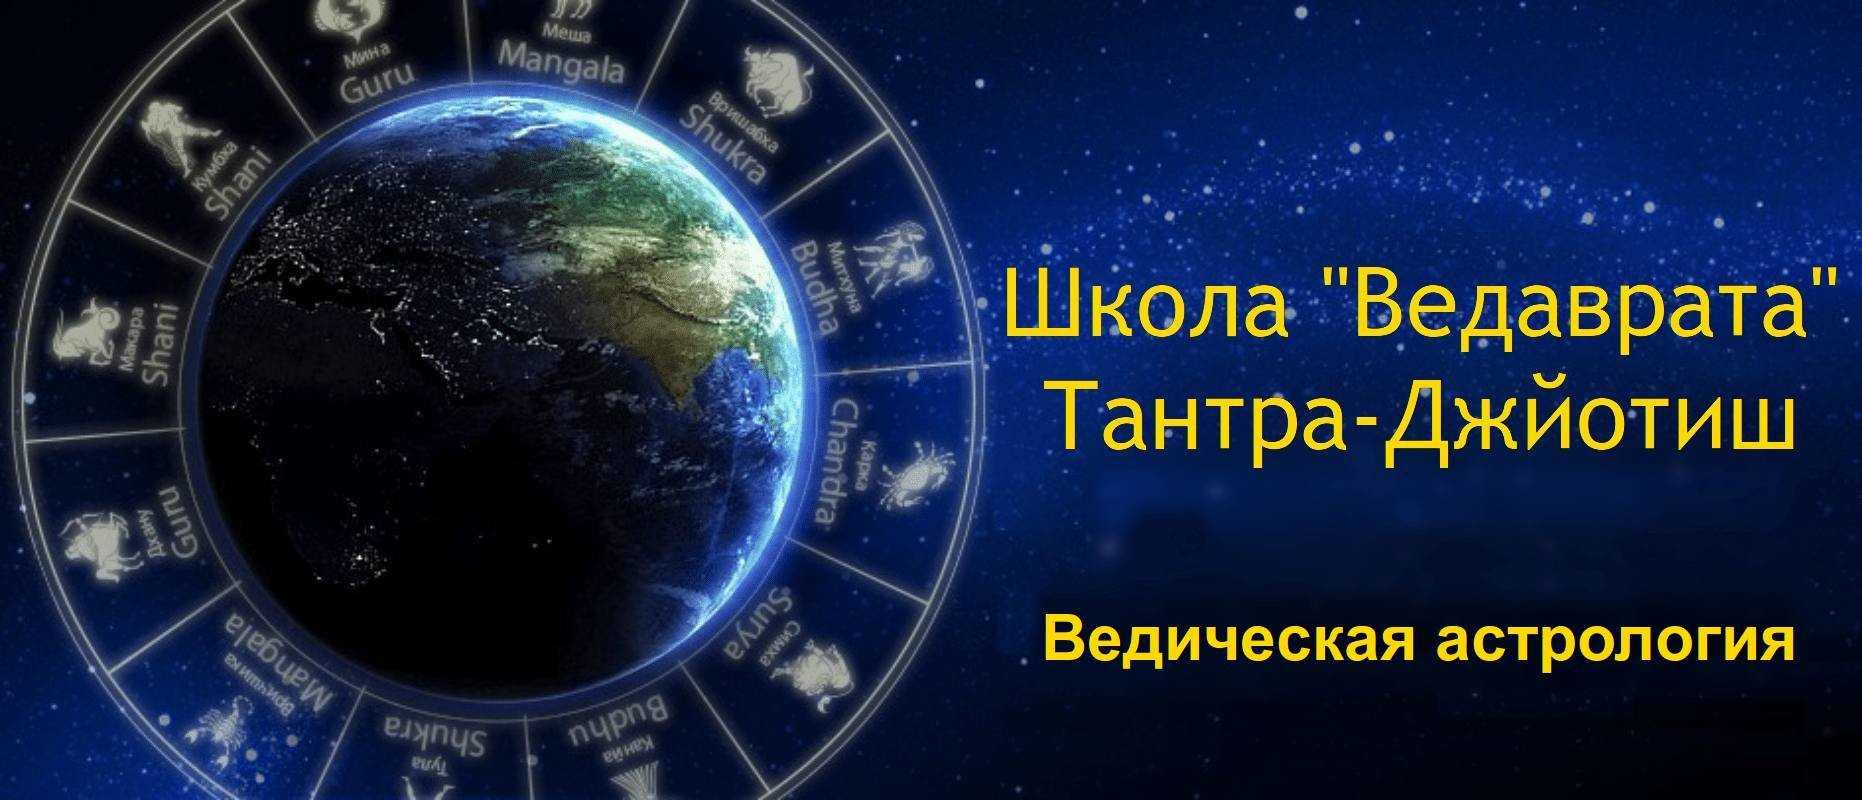 *** Школа Ведаврата - Ведична астрологія Джйотіш - Хмельницький,Україна 2016 ***